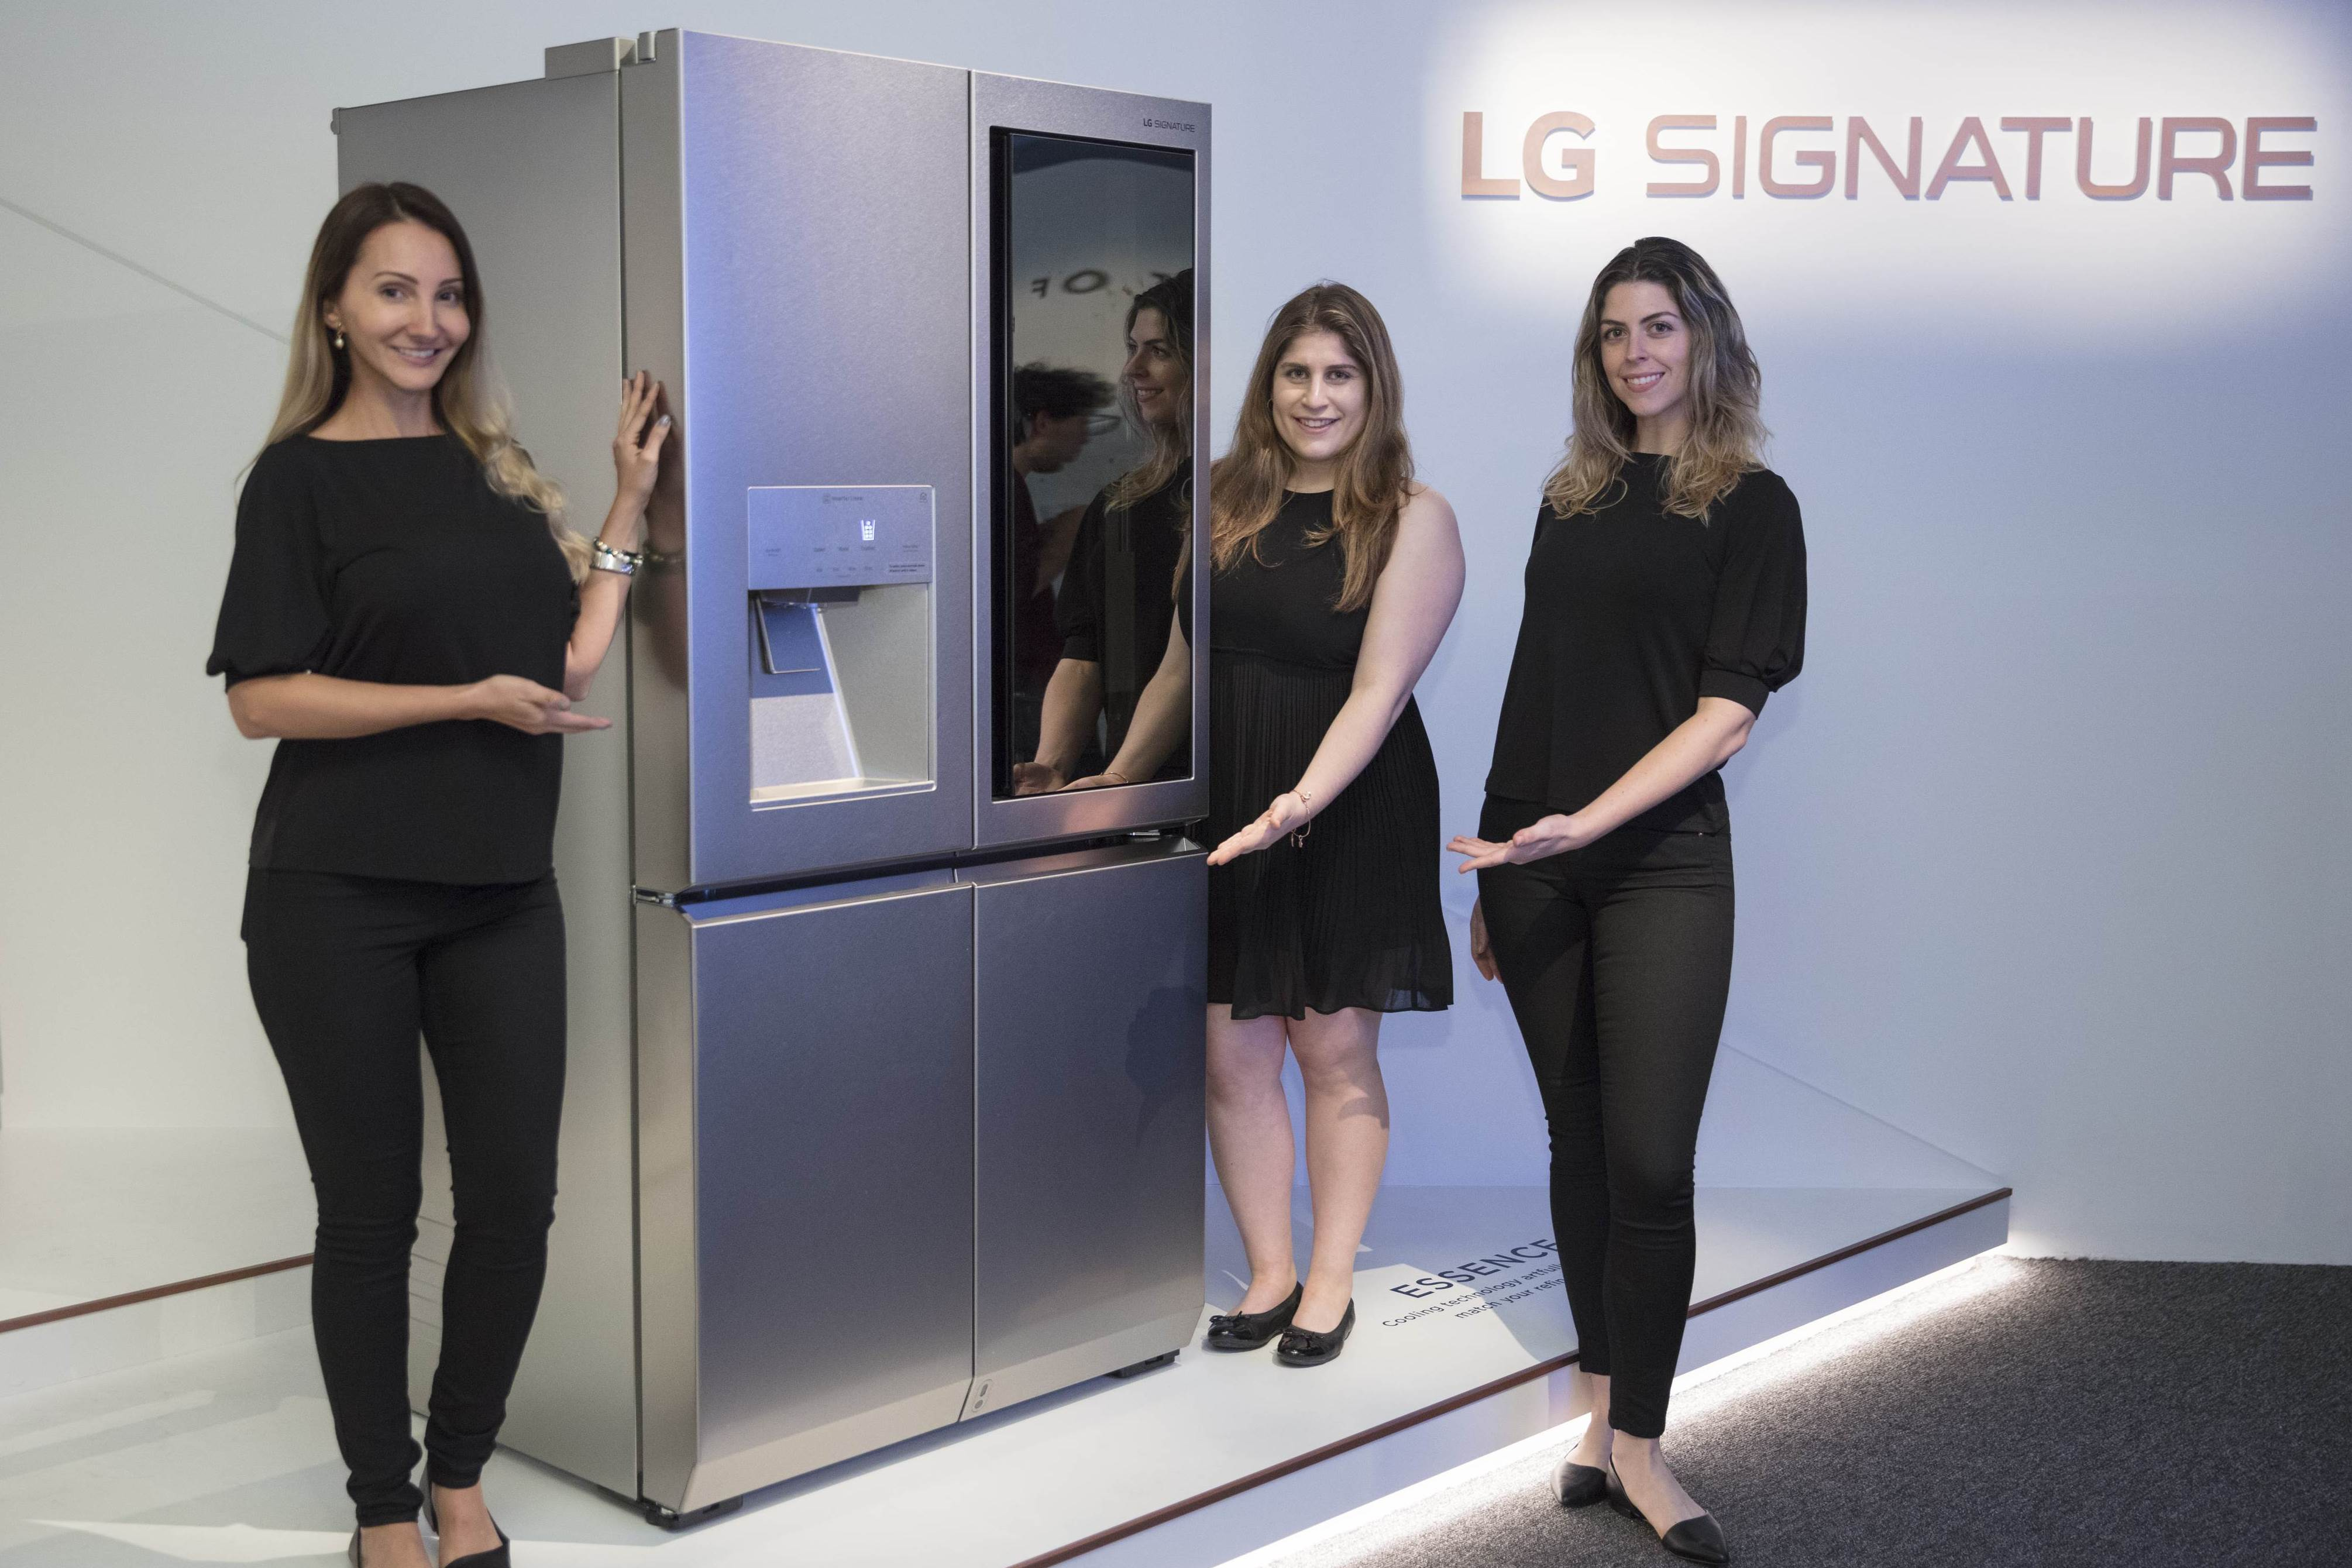 LG전자가 현지시간 6일부터 9일까지 미국 플로리다주 마이애미비치에서 미국 최대 미술전시회 '아트바젤 마이애미비치(Art Basel Miami Beach)가 열리는 가운데, LG 시그니처 팝업 전시관인 LG 시그니처 하우스를 열었다. LG전자 모델들이 LG 시그니처 하우스에 전시된 LG 시그니처 냉장고를 소개하고 있다.